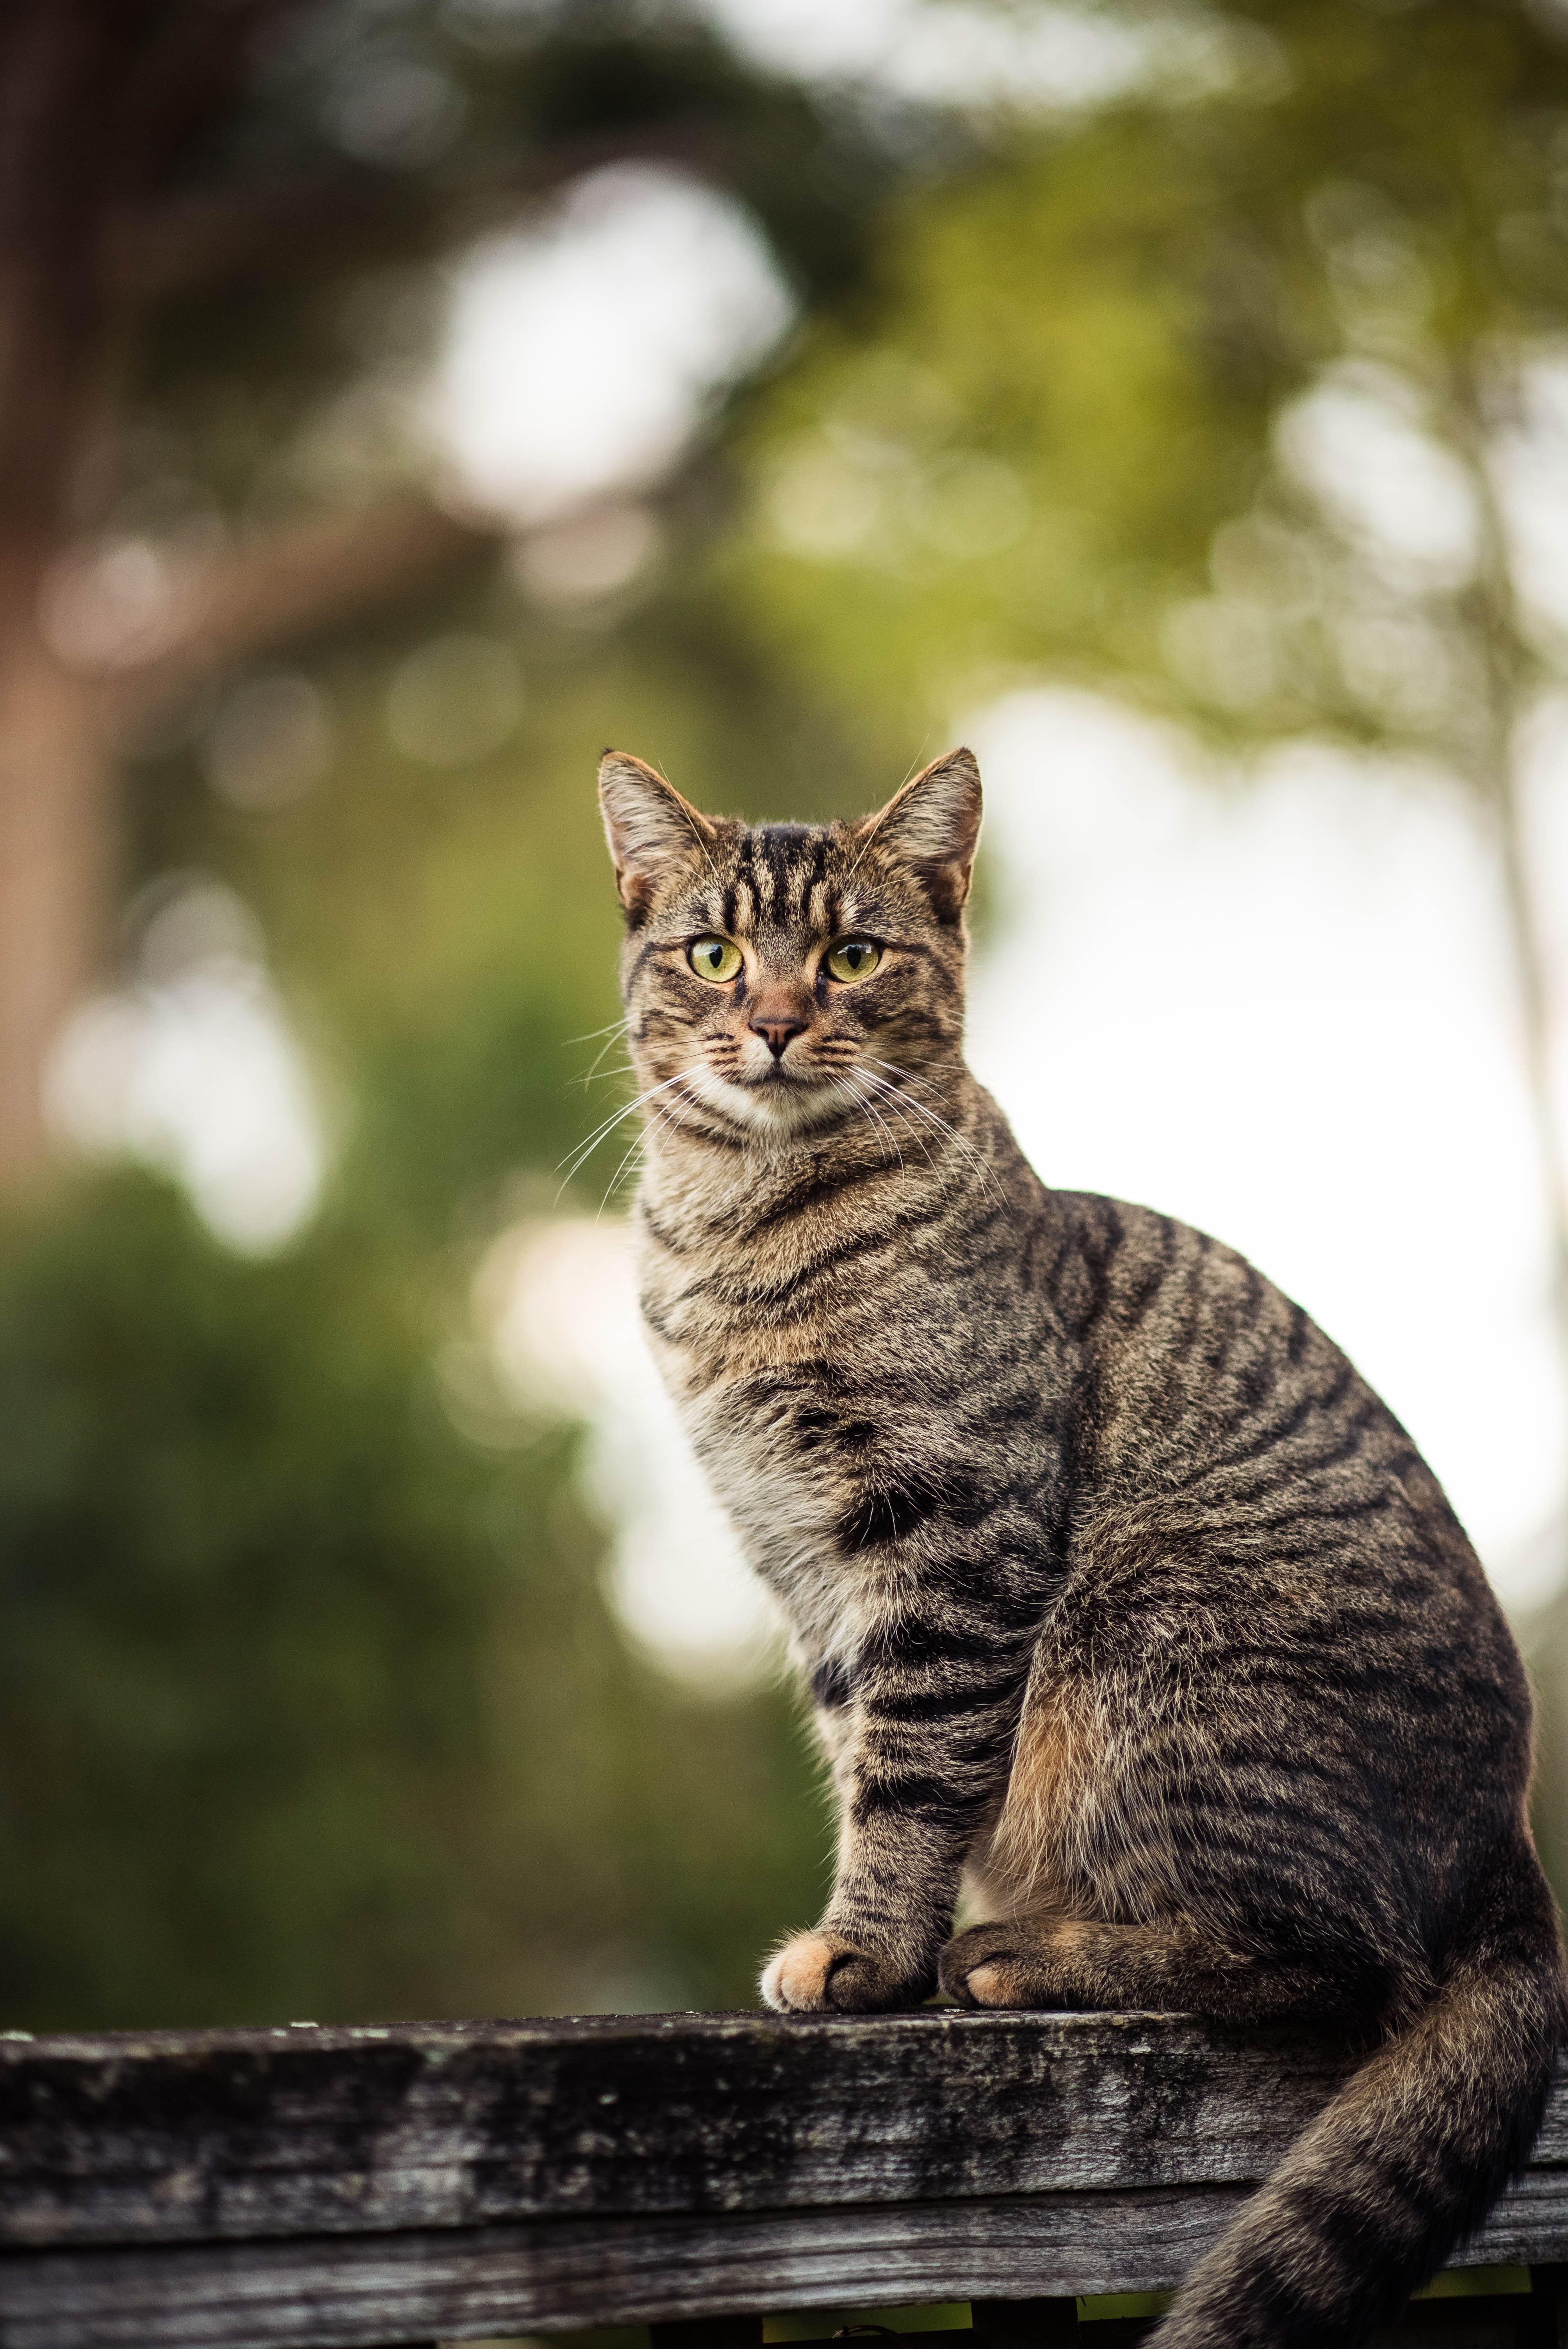 Beautiful Tabby Cat In 2020 Grey Tabby Cats Tabby Cat Cats